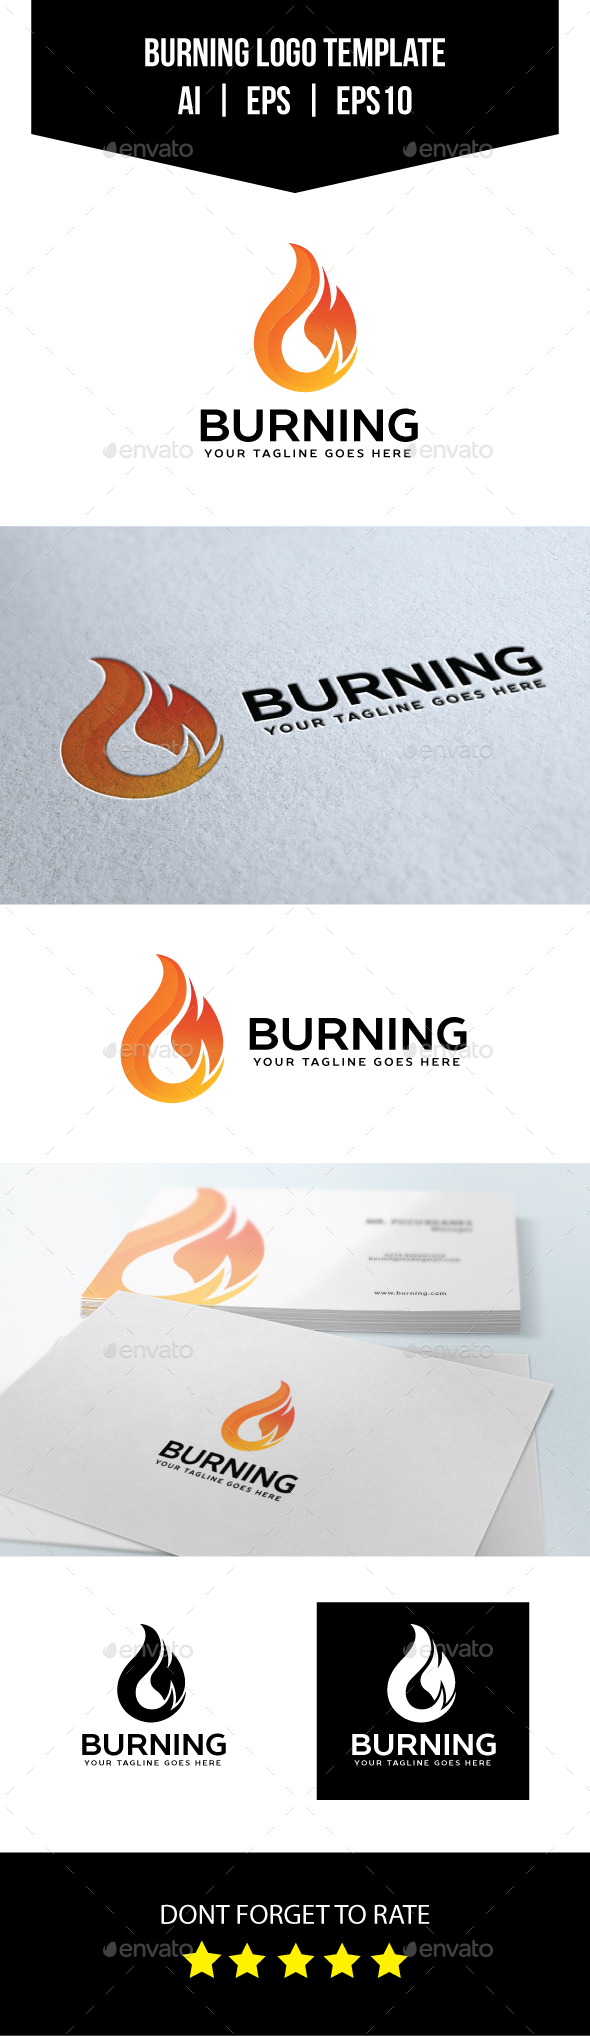 Burning Logo Template - Symbols Logo Templates